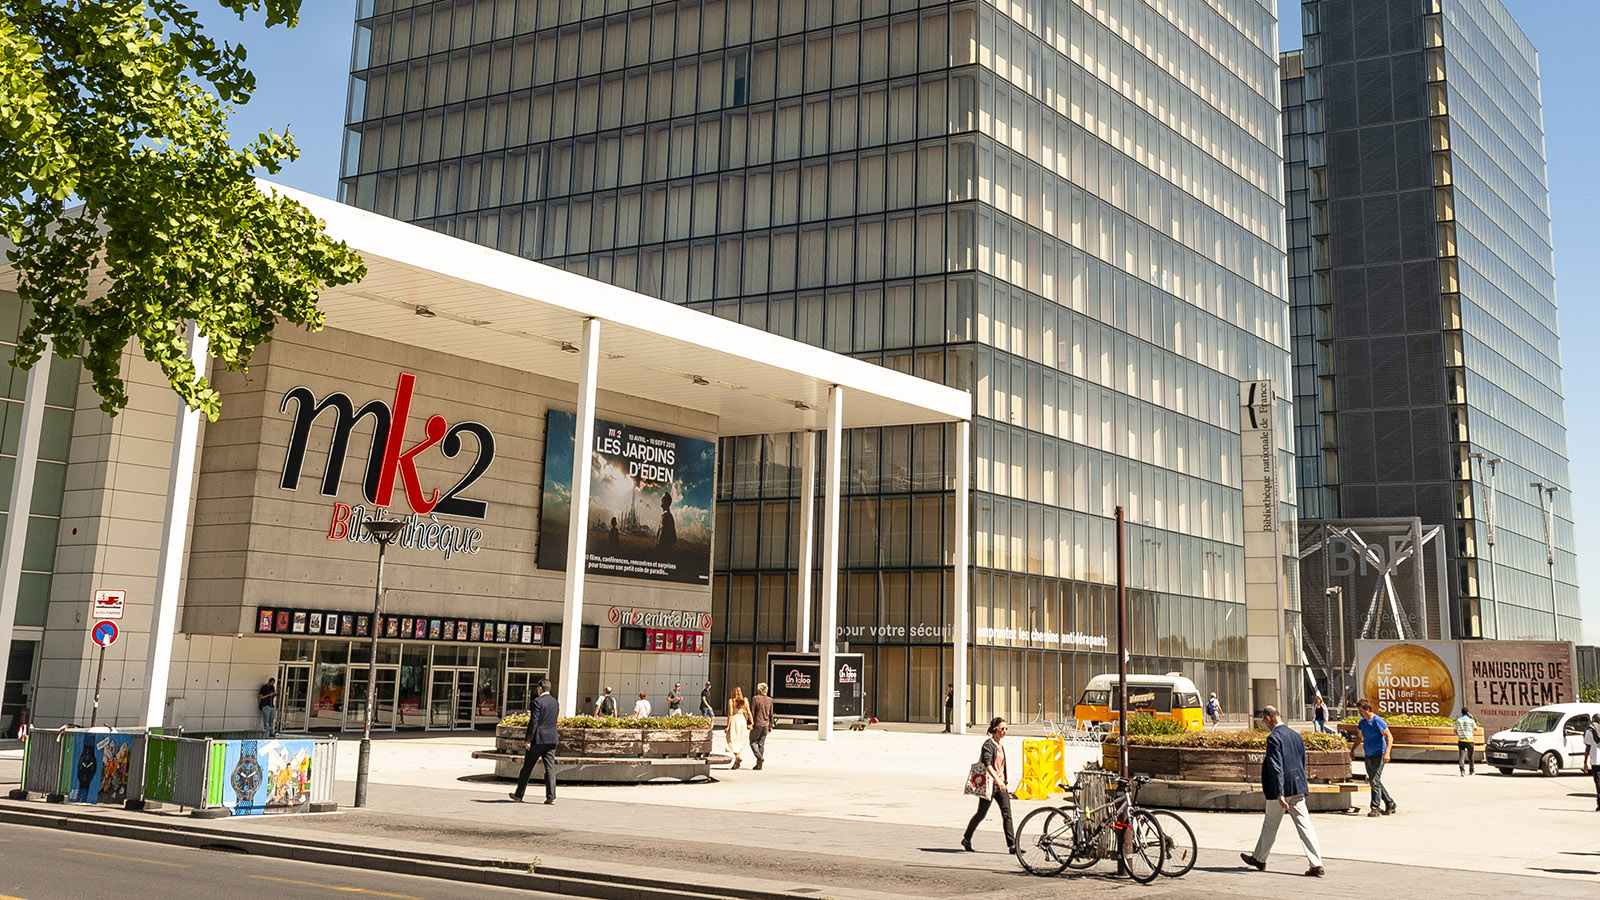 Tolbiac: Blick auf Kino und Nationalbibliothek. Foto: Hilke Maunder